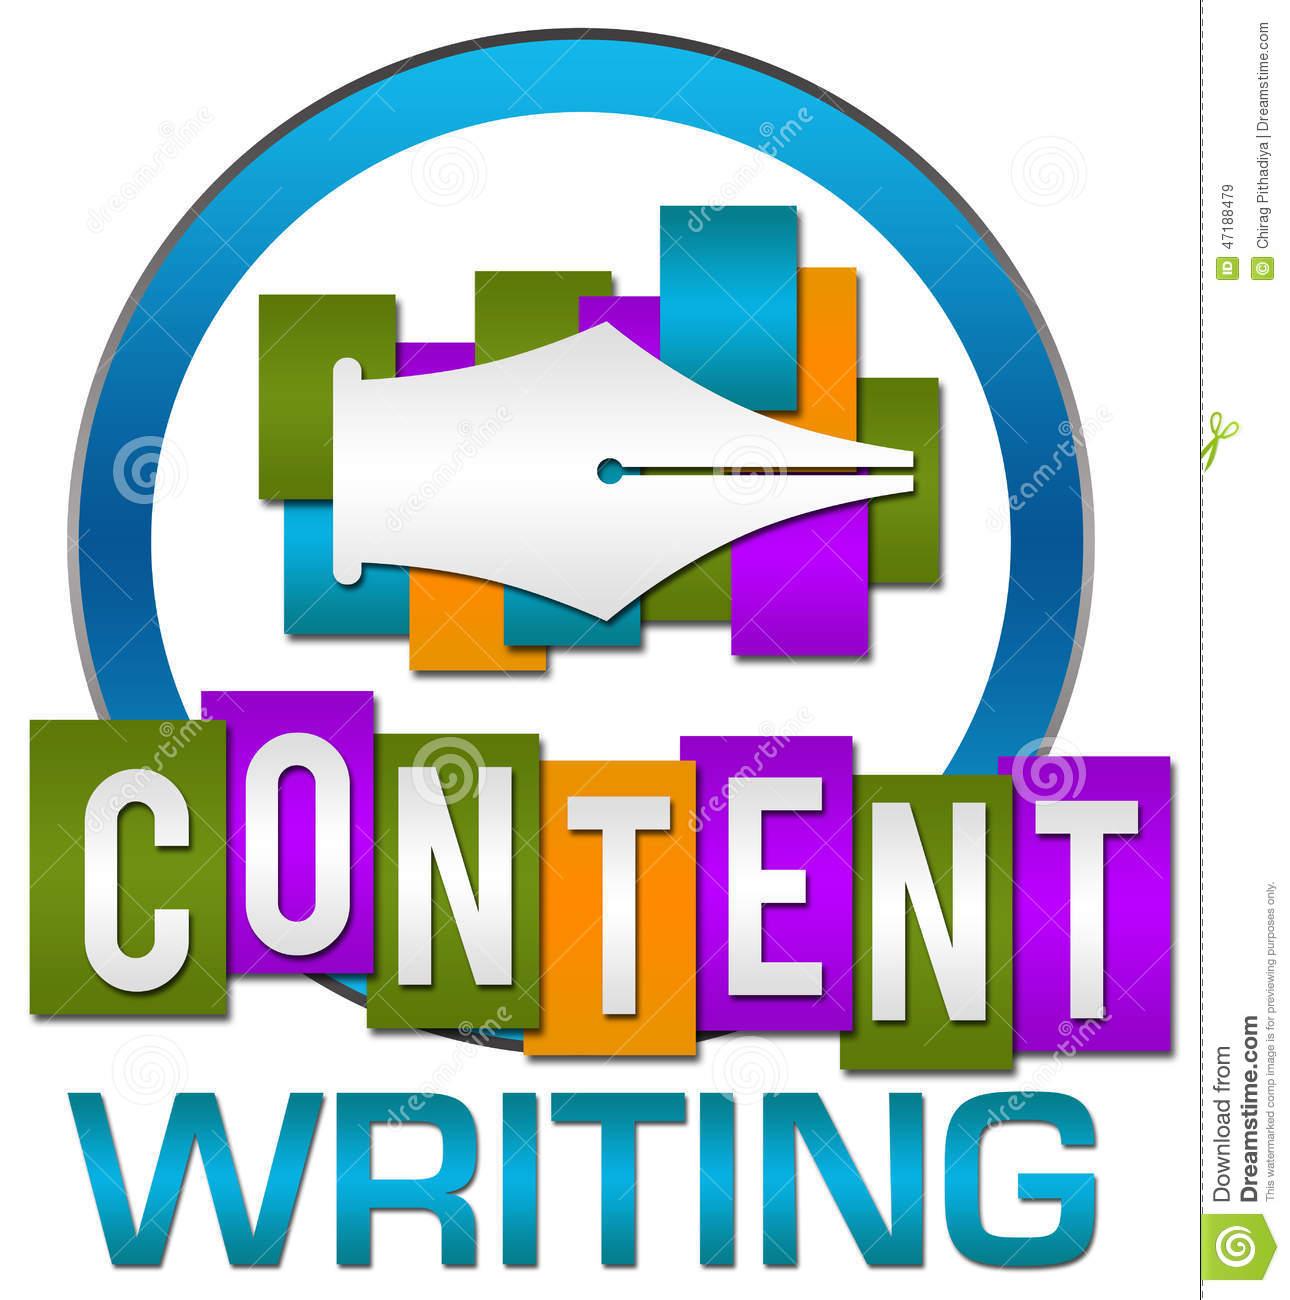 I Will Write Best 450words Unique SEO Web-Content